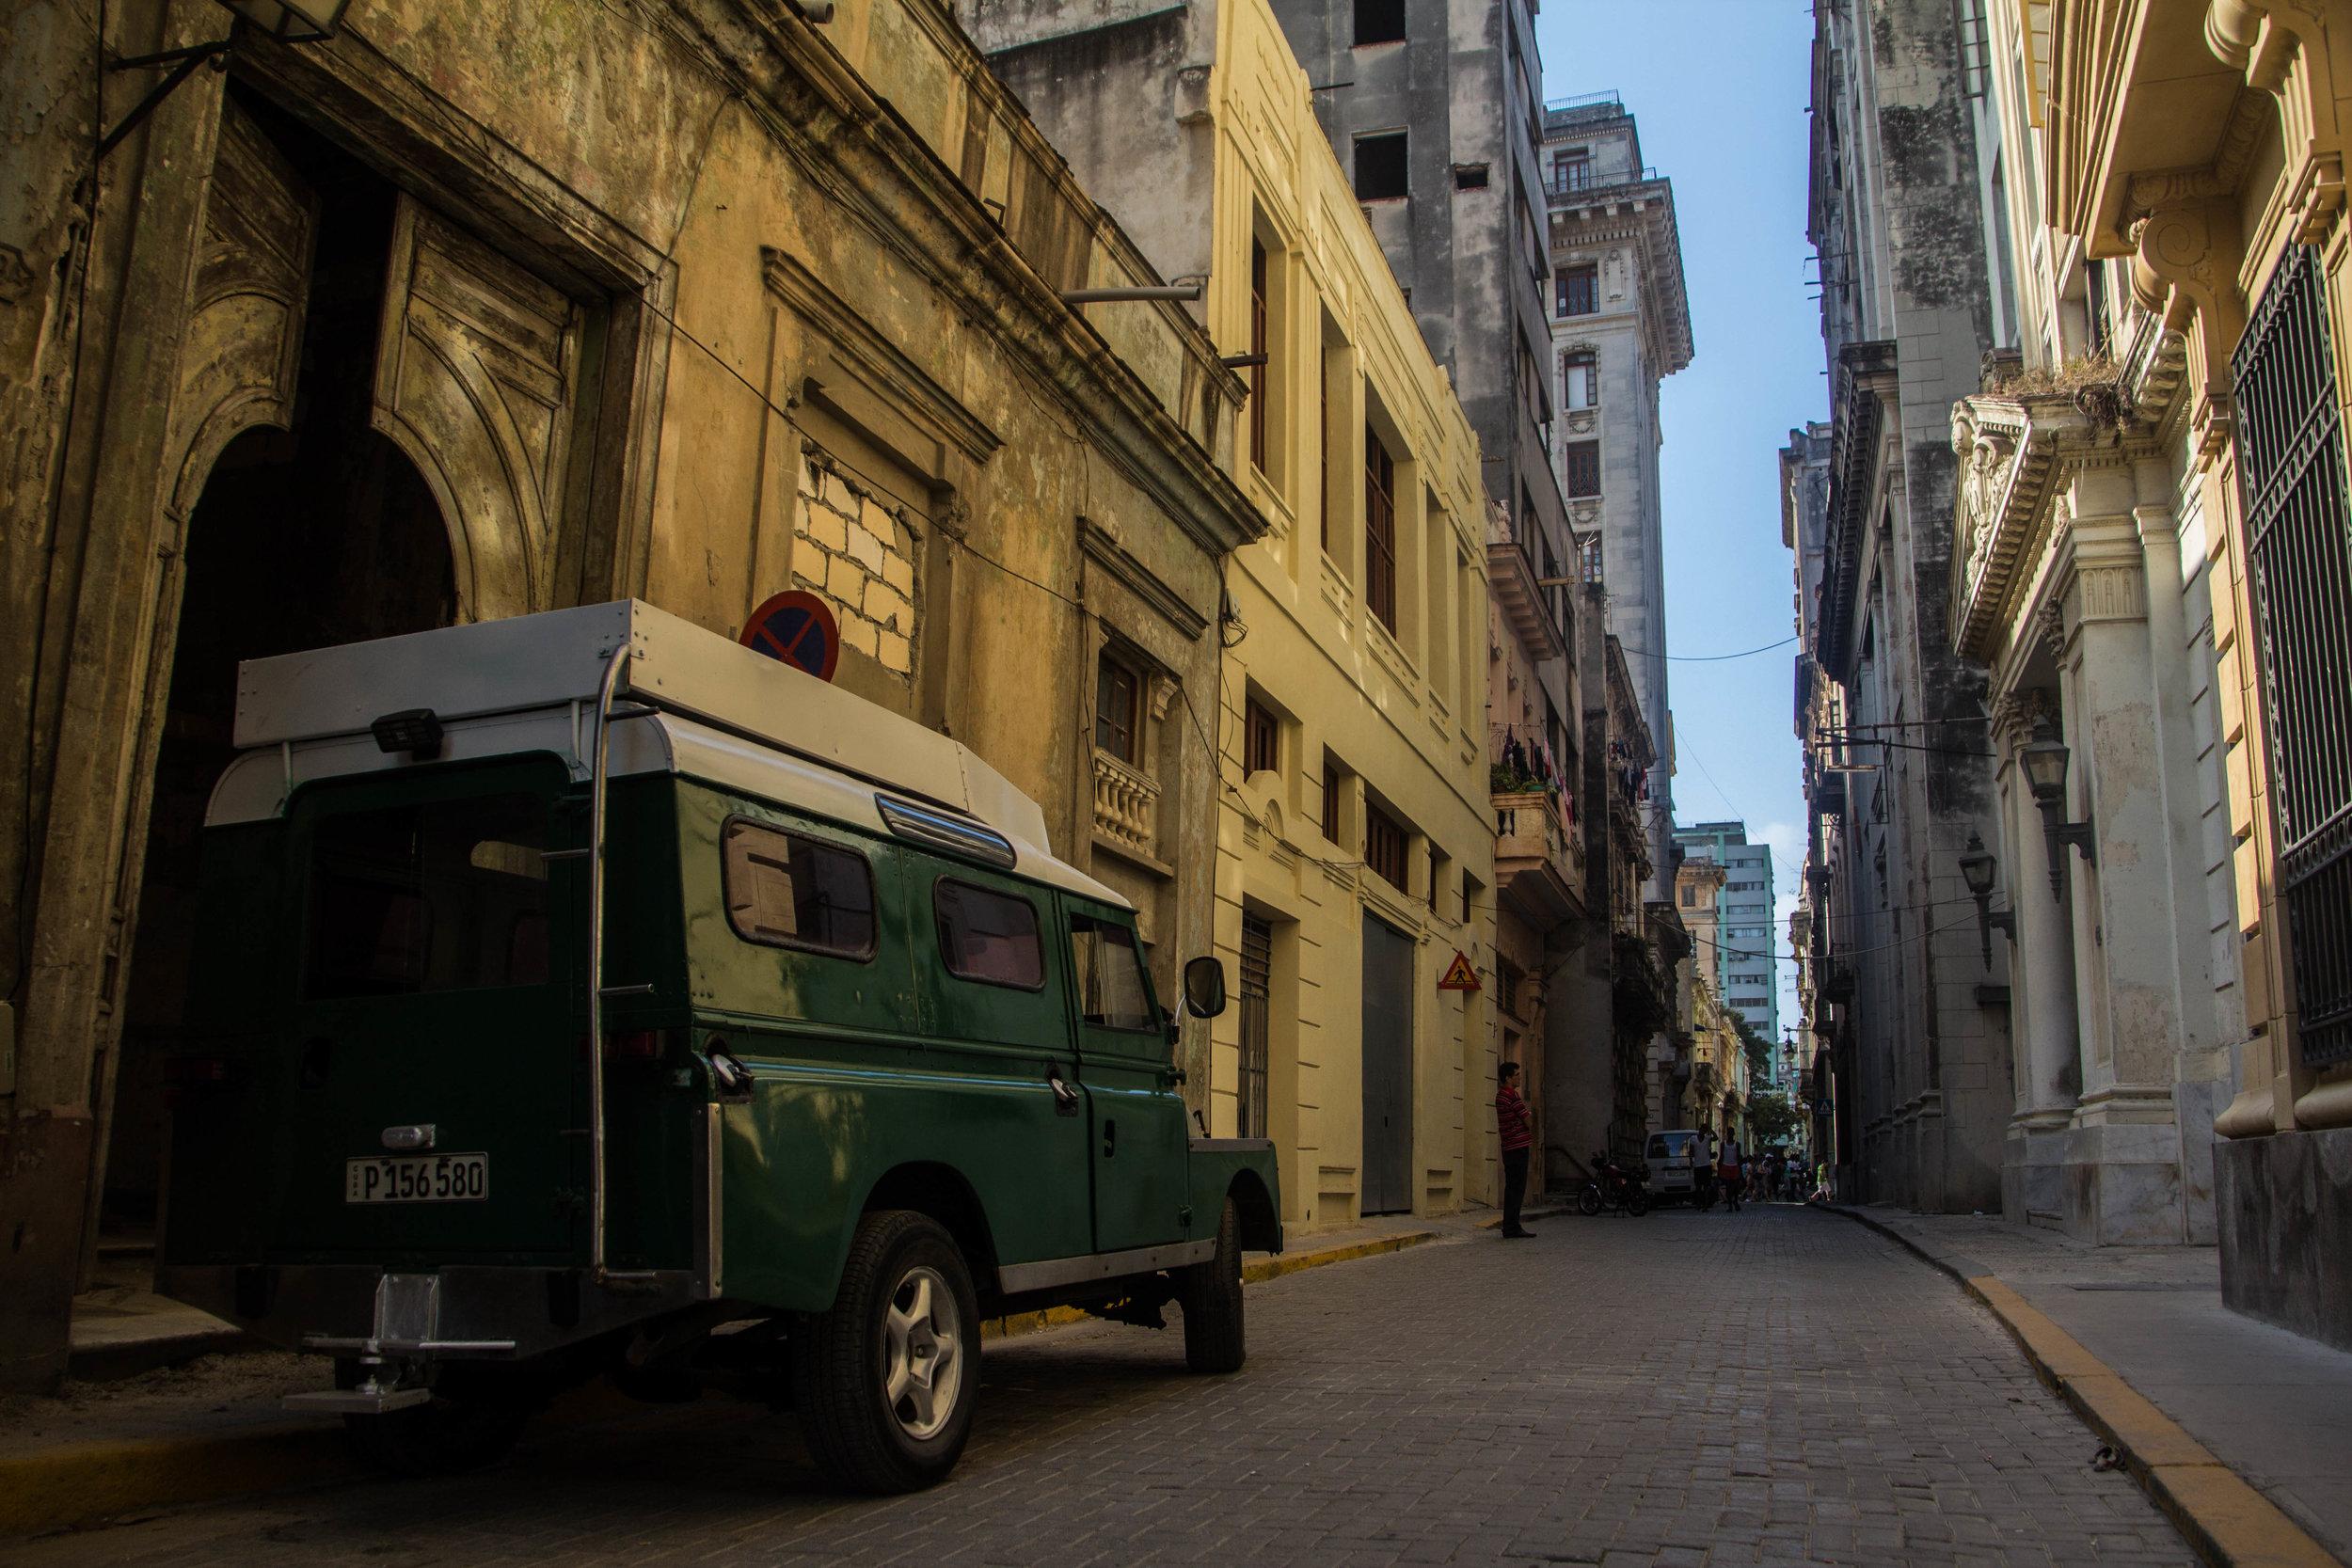 streets old havana cuba-1-2-2.jpg